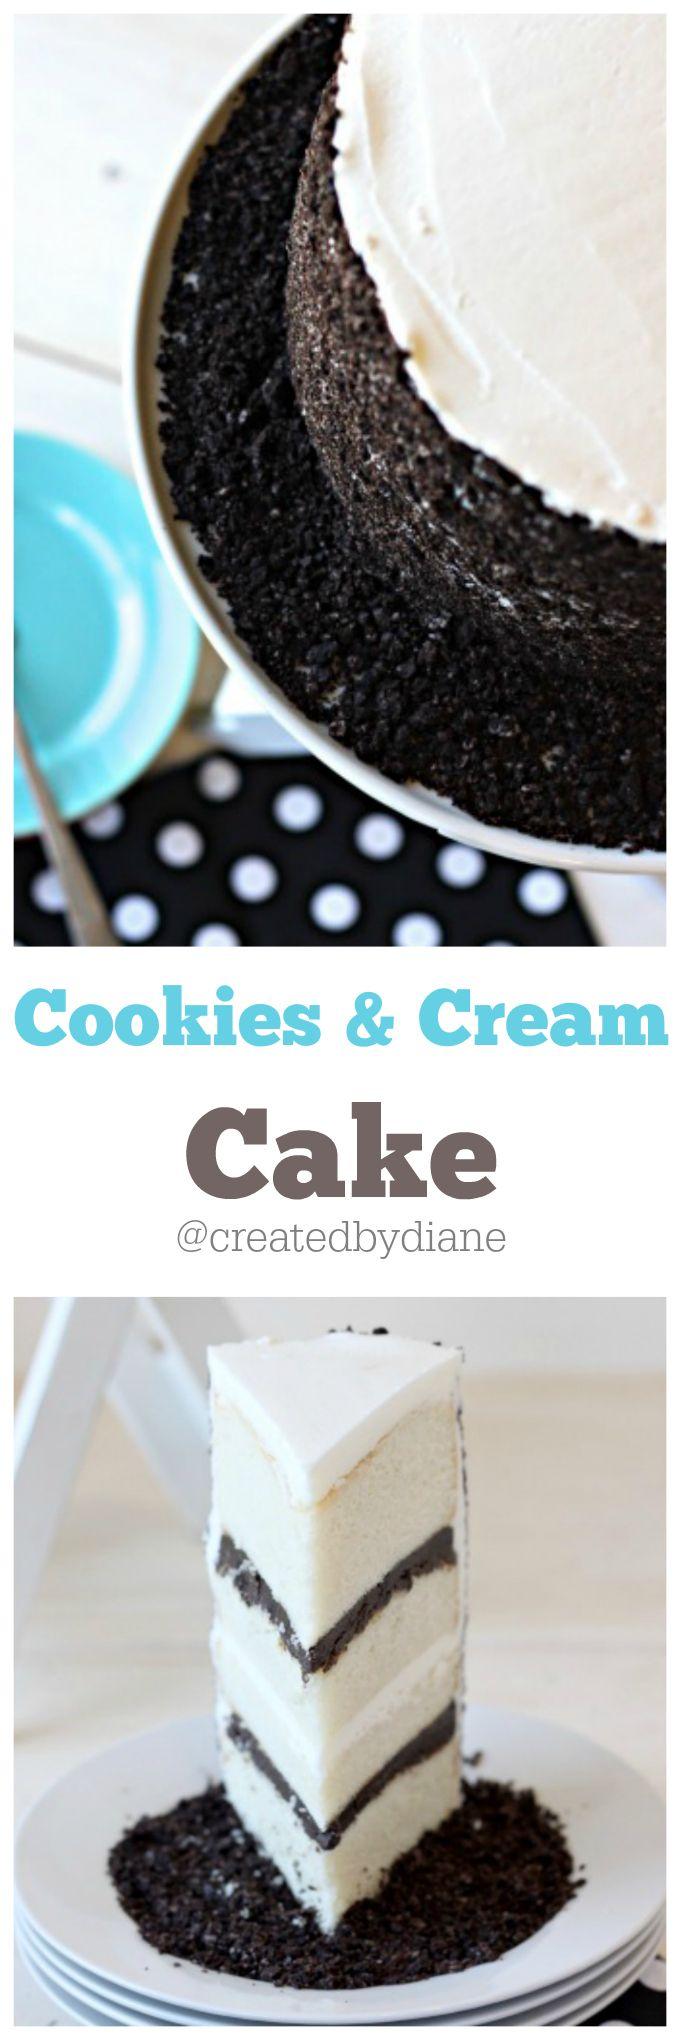 Cookies and Cream Cake @createdbydiane